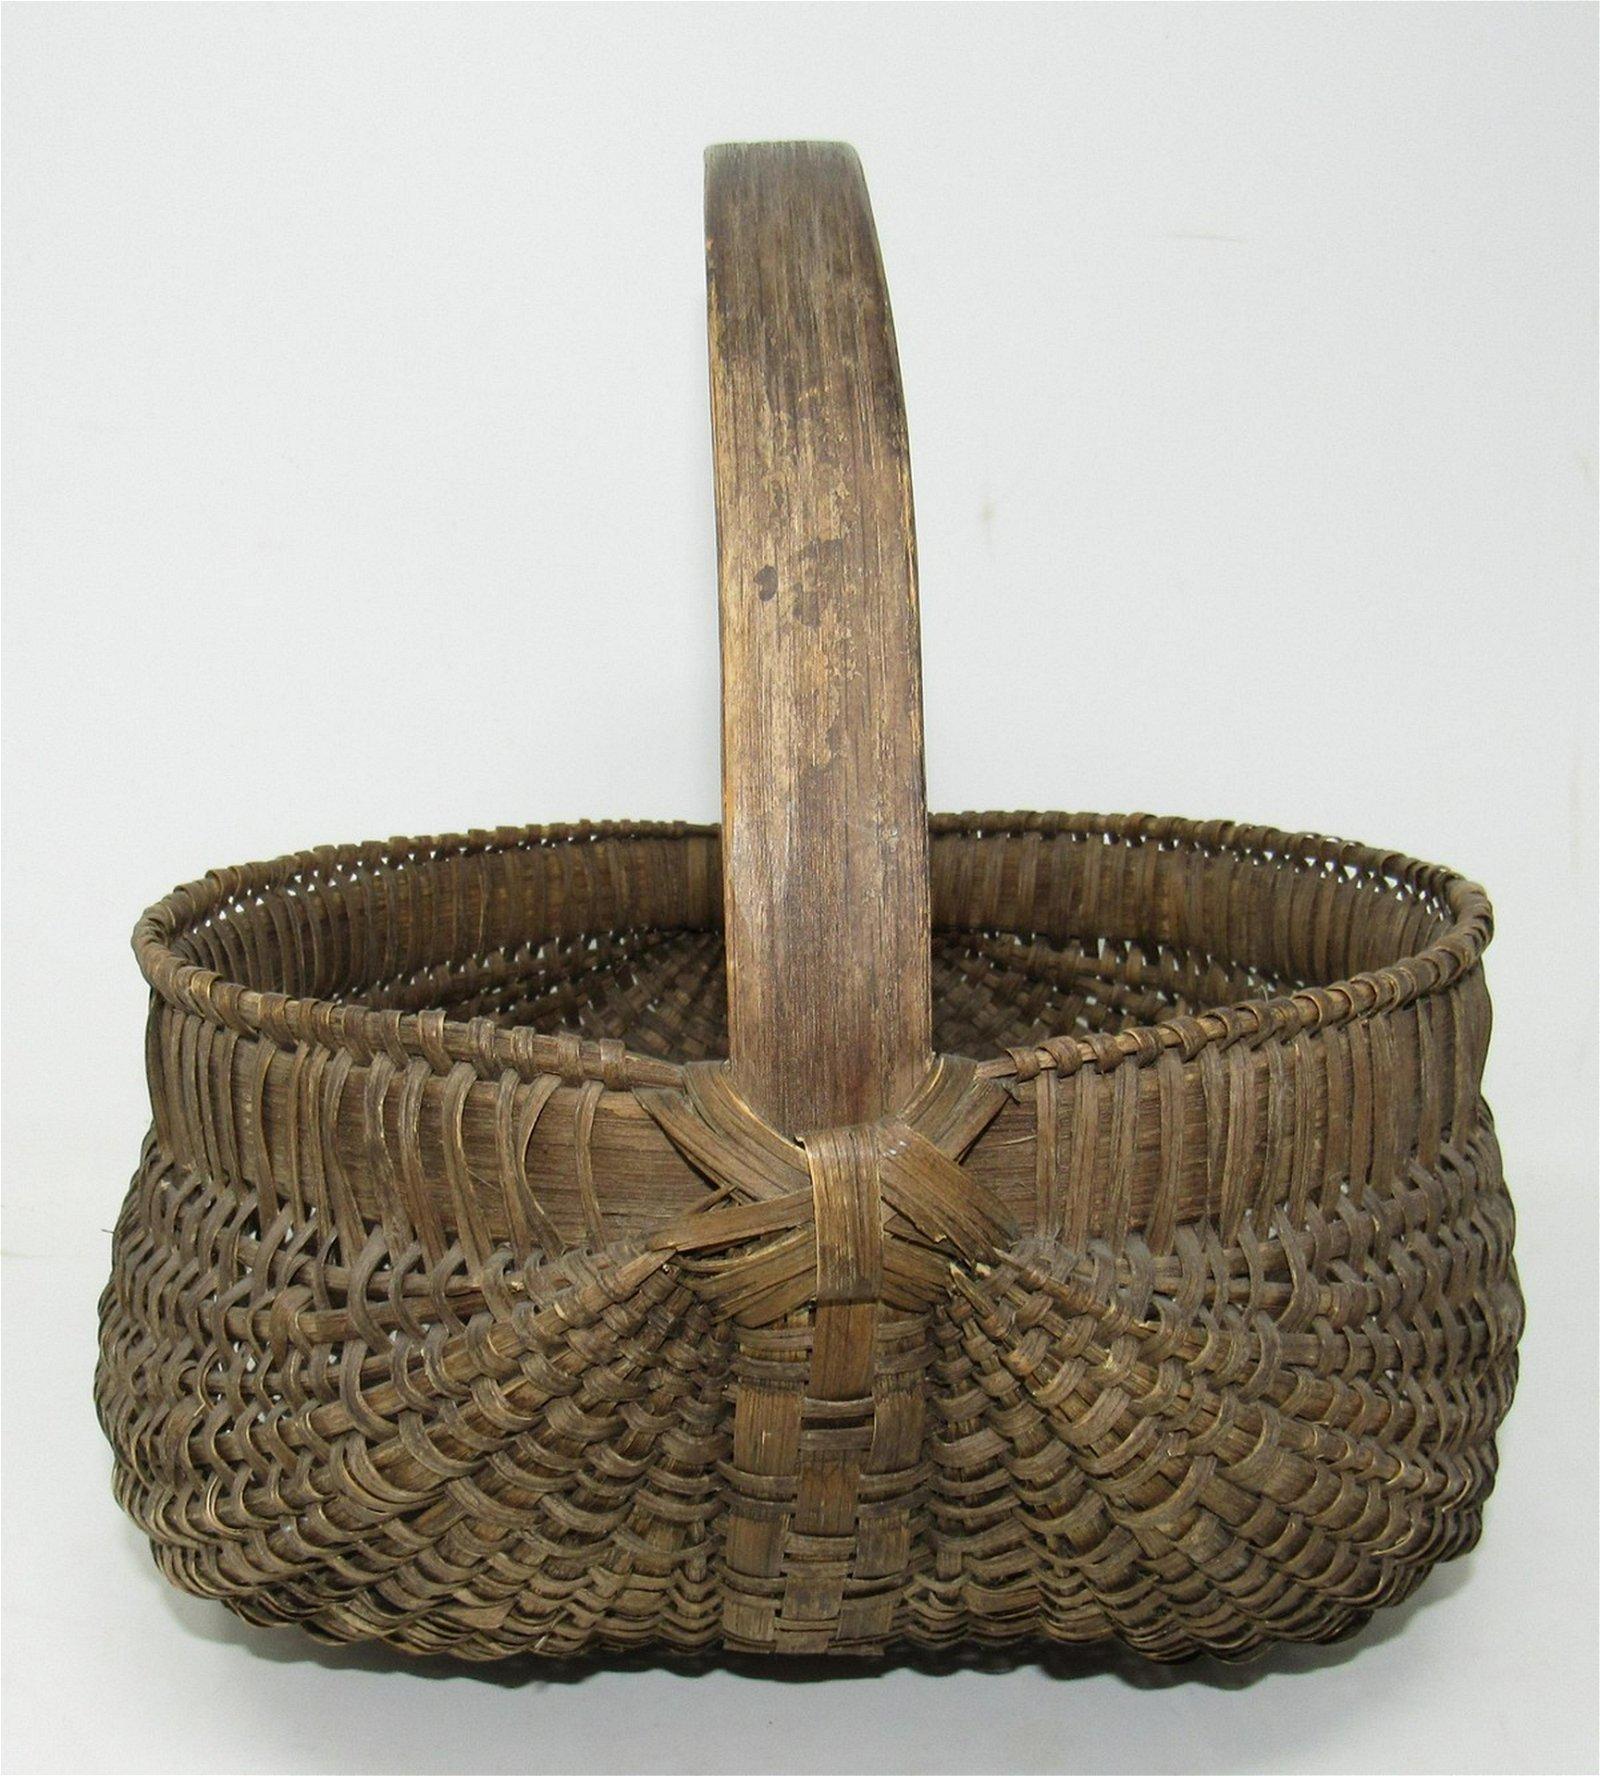 Coker Creek Crafts Early Signed Basket